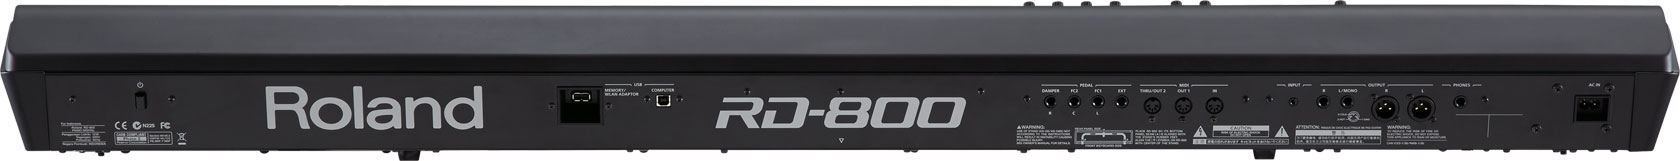 rd-800_back_gal